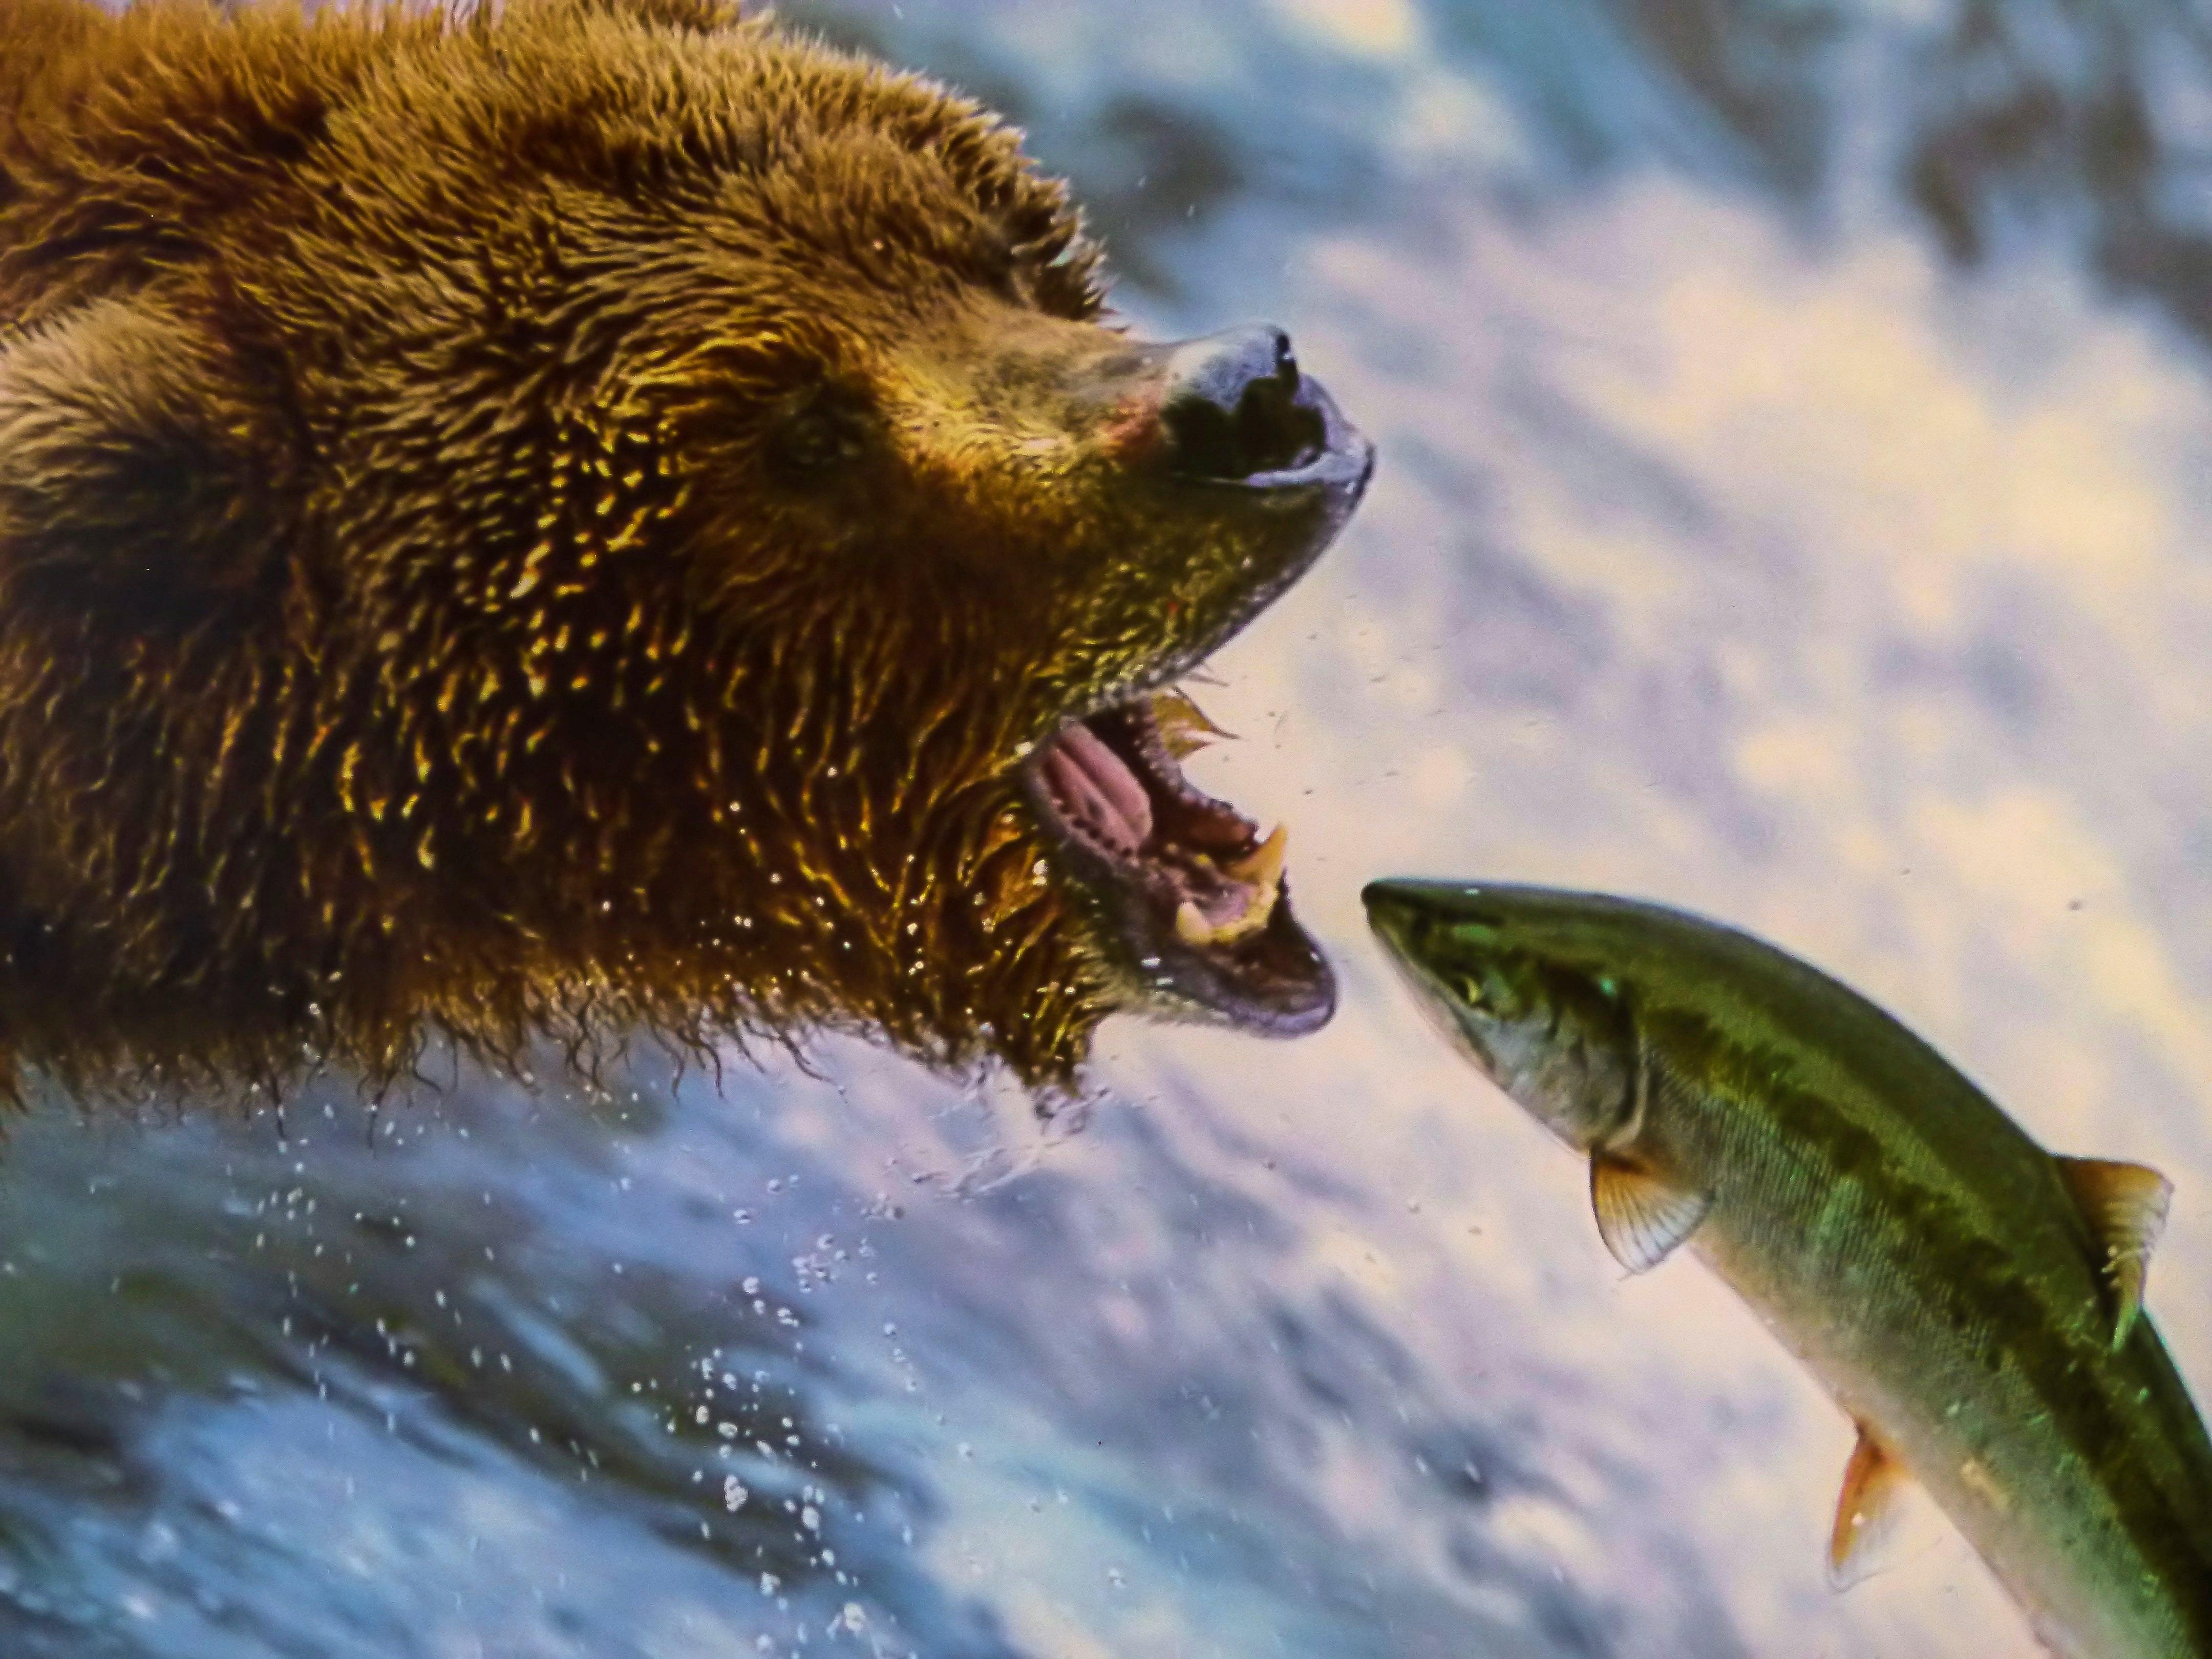 Free images nature animal wildlife food mammal fish for Bear catching fish